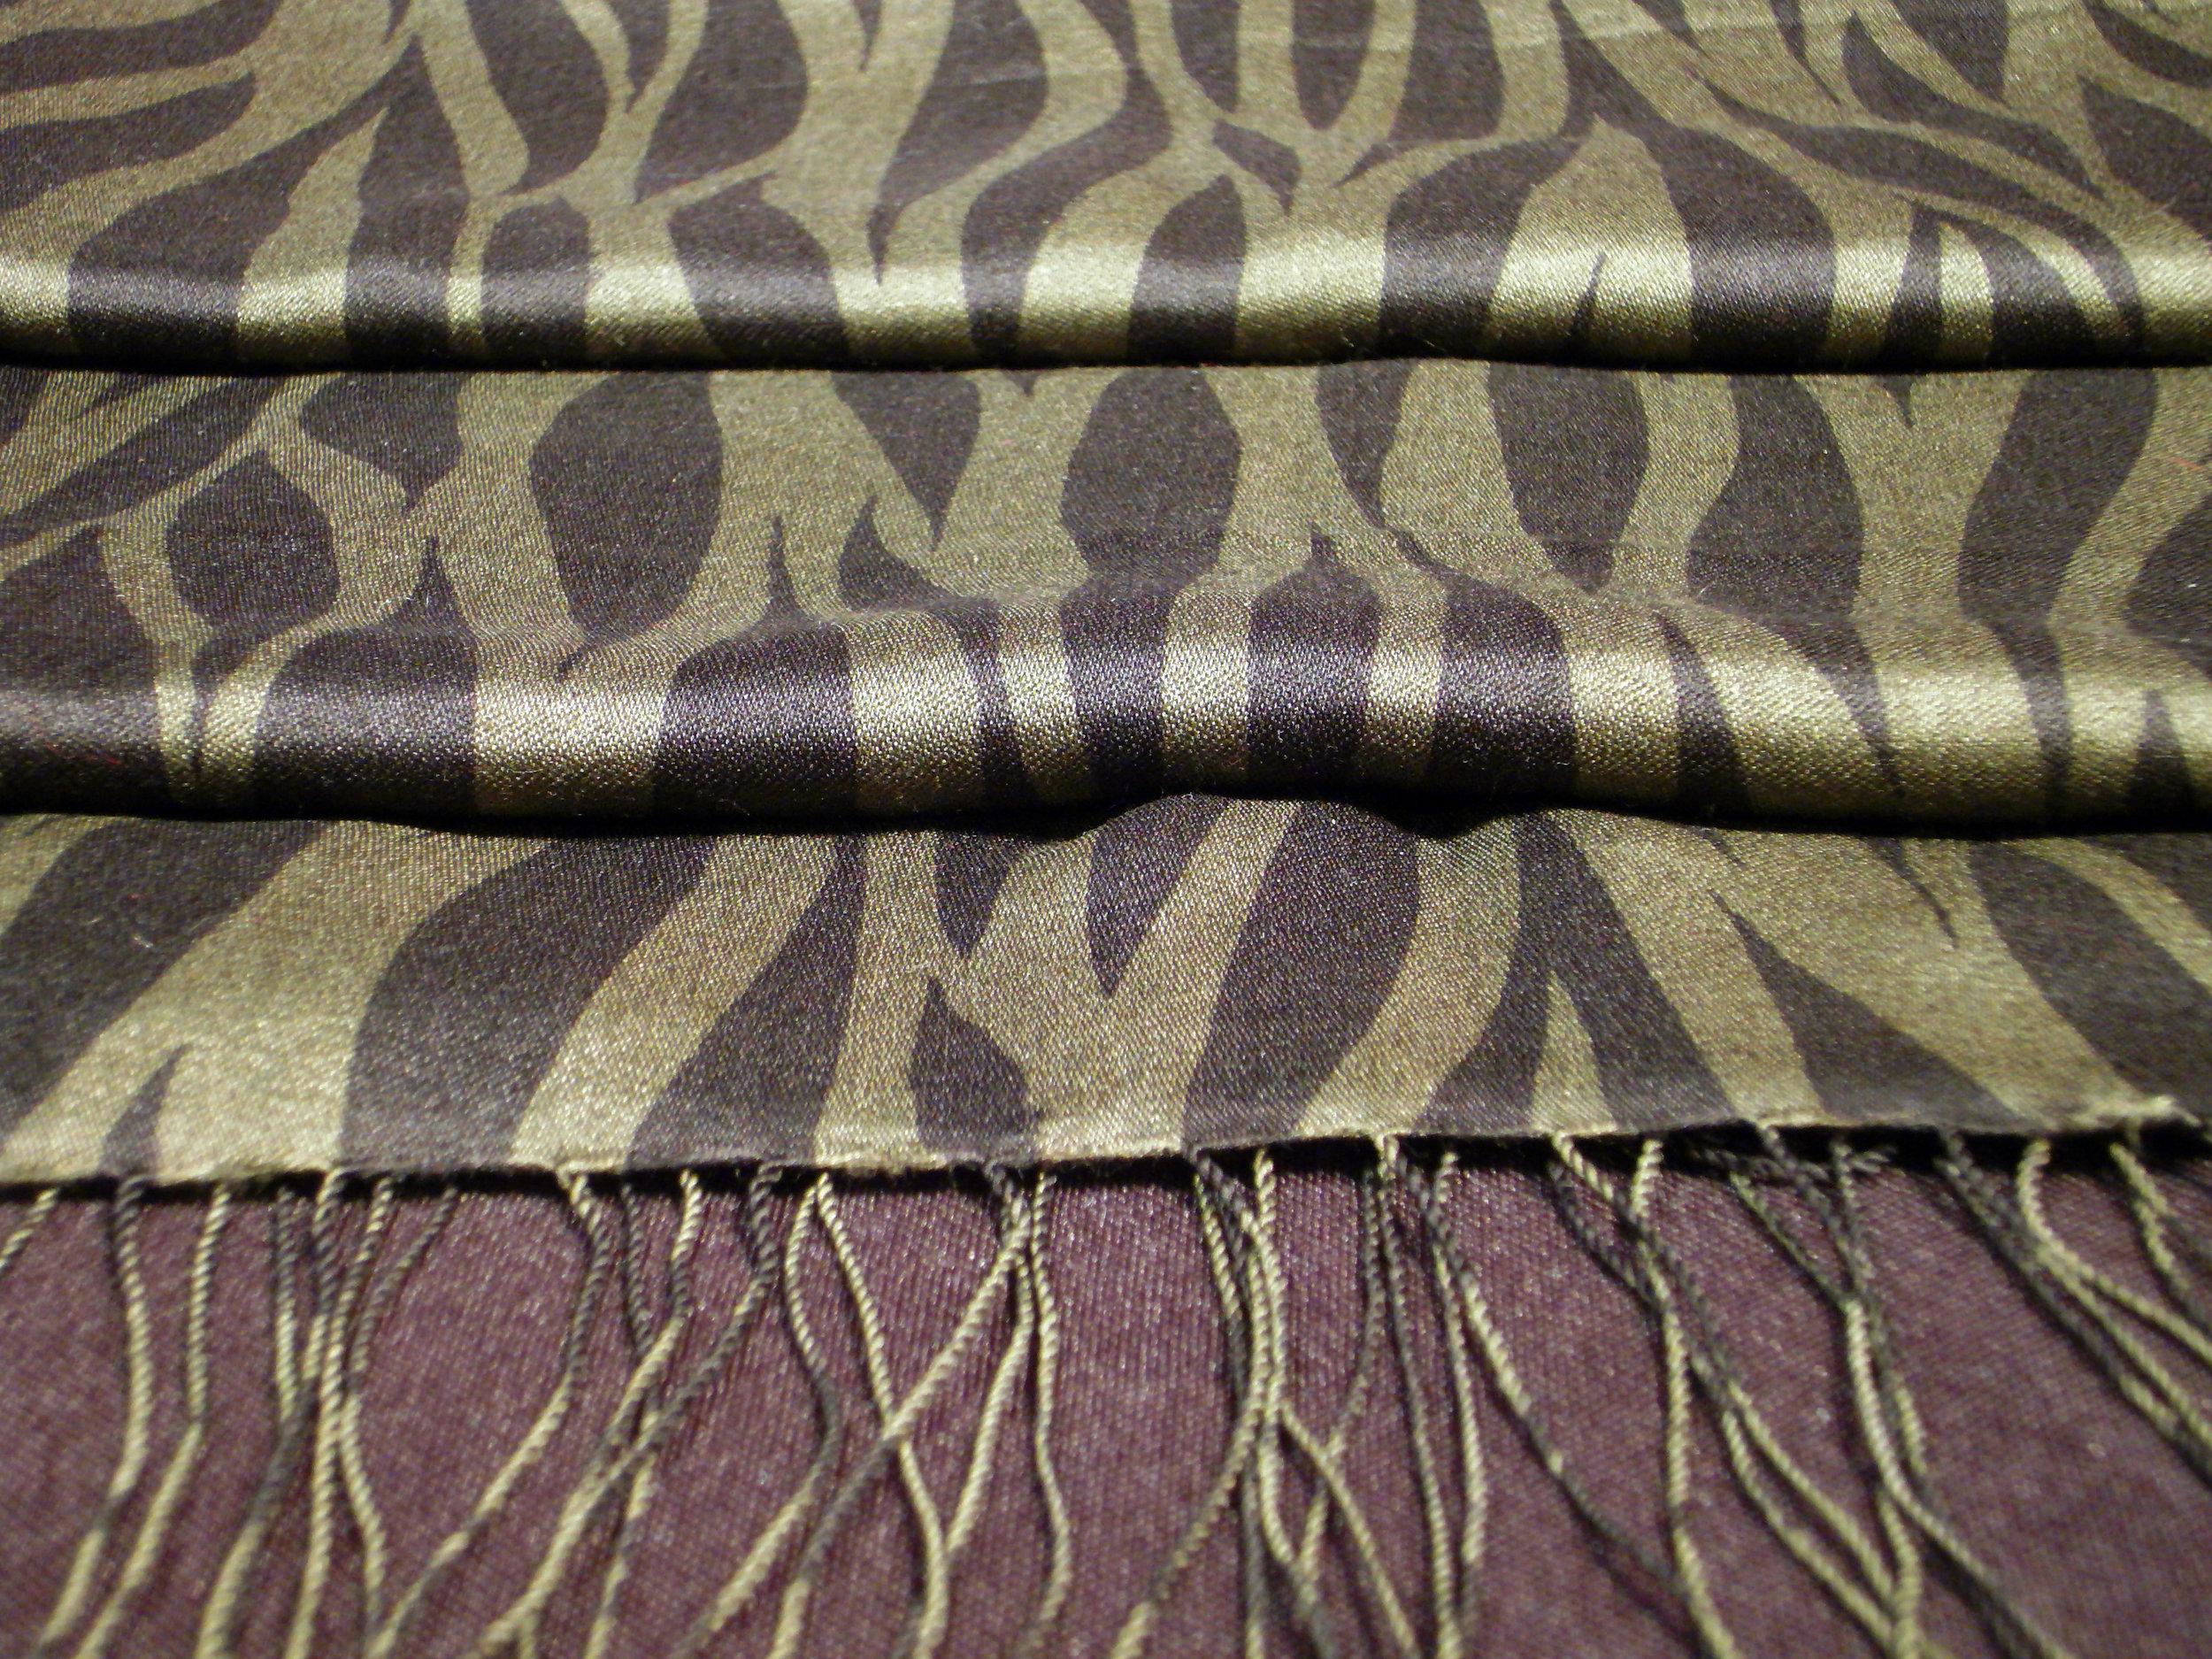 Aimai Sample 2 - KPD 5 Fine Silk Scarf Detail.JPG